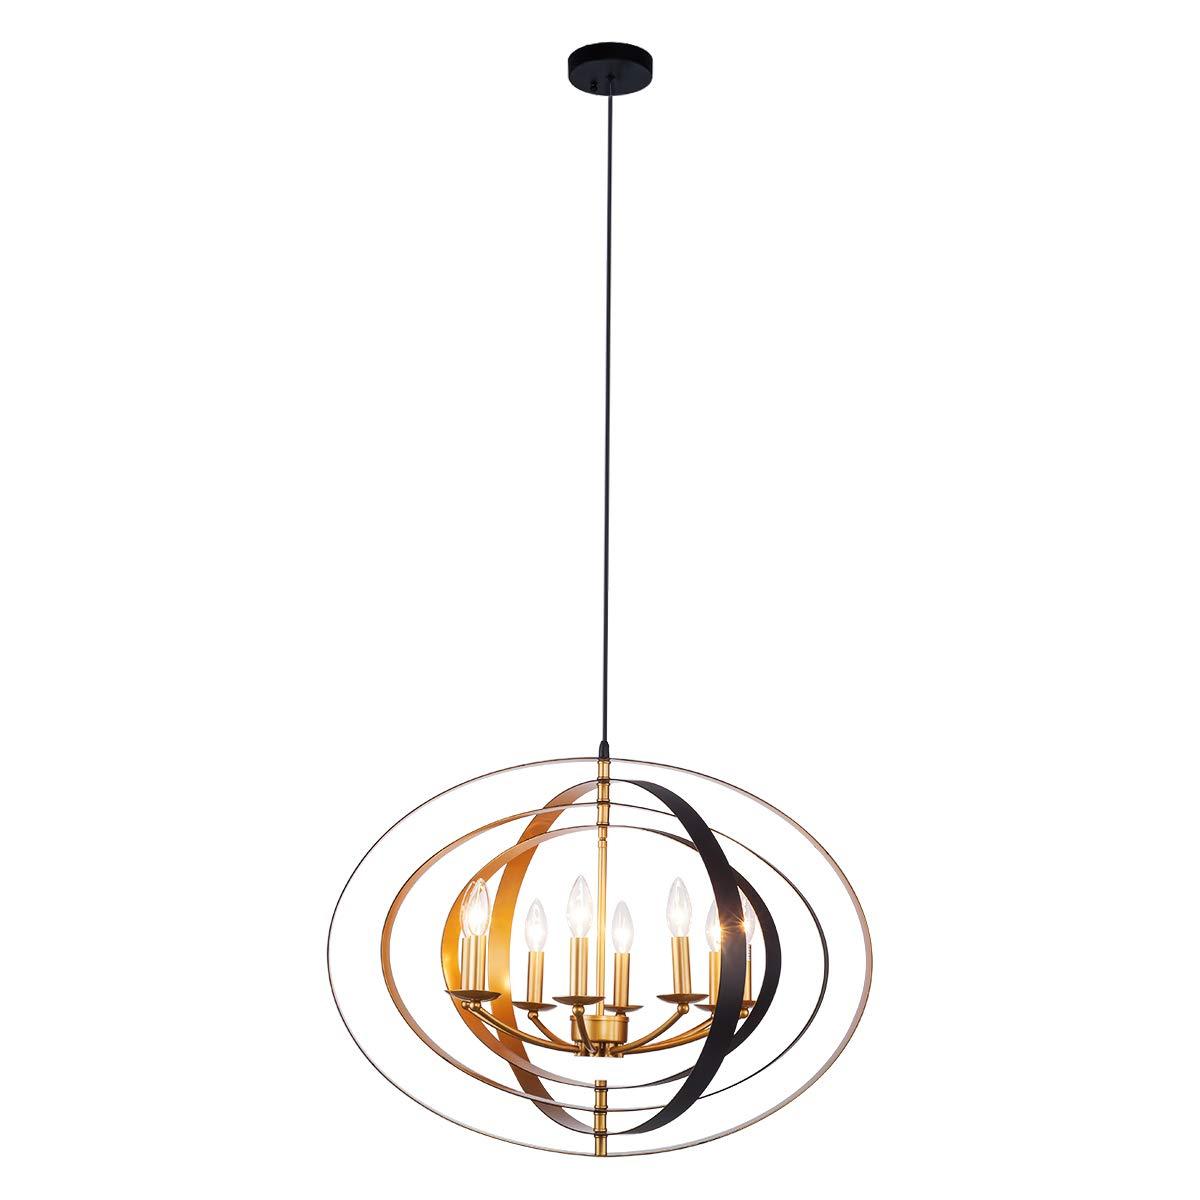 Lanros Industrial Sphere Foyer Lighting, 8-Light Vintage Adjustable Globe Chandelier with Pivoting Interlocking Rings for Dining Room, Entry, Living Room, Stairwell, Bathroom, Restaurant, Black/Gold+